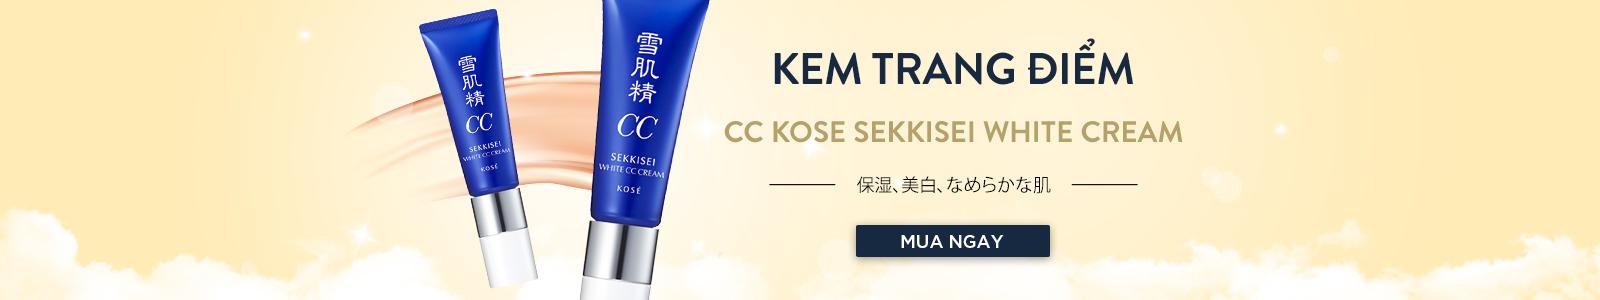 Kem trang điểm CC Kose Sekkisei White Cream